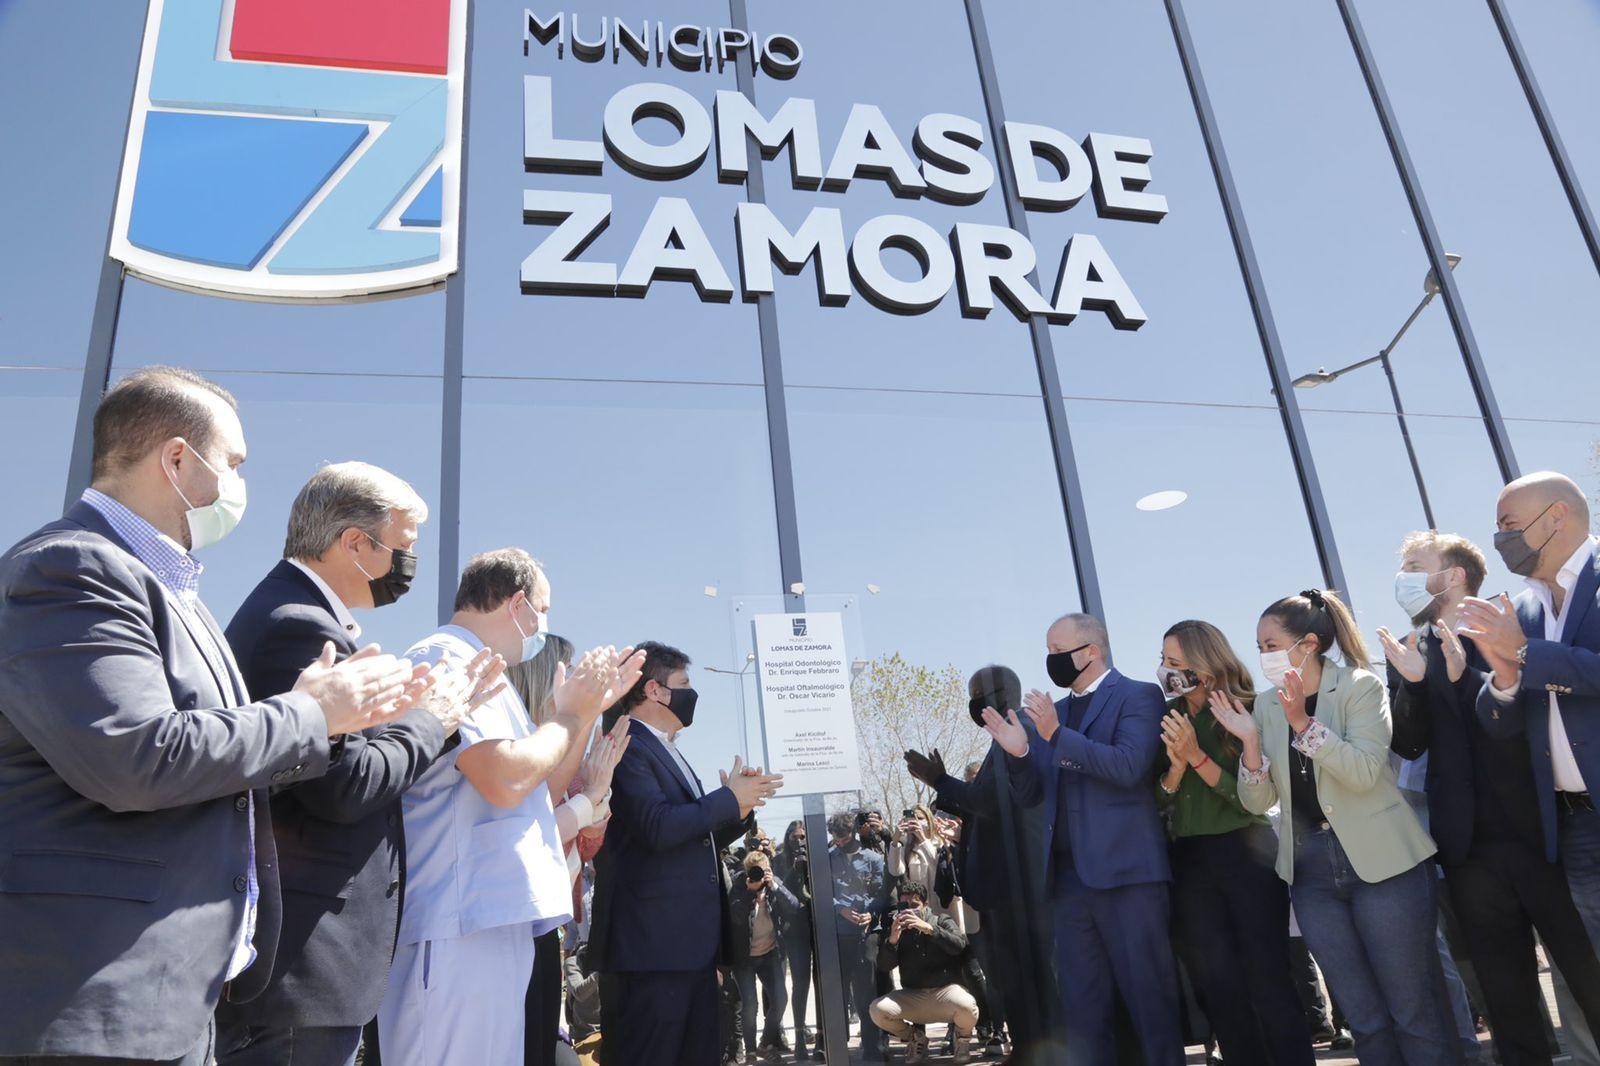 kicillof e insaurralde inauguraron el nuevo hospital de lomas